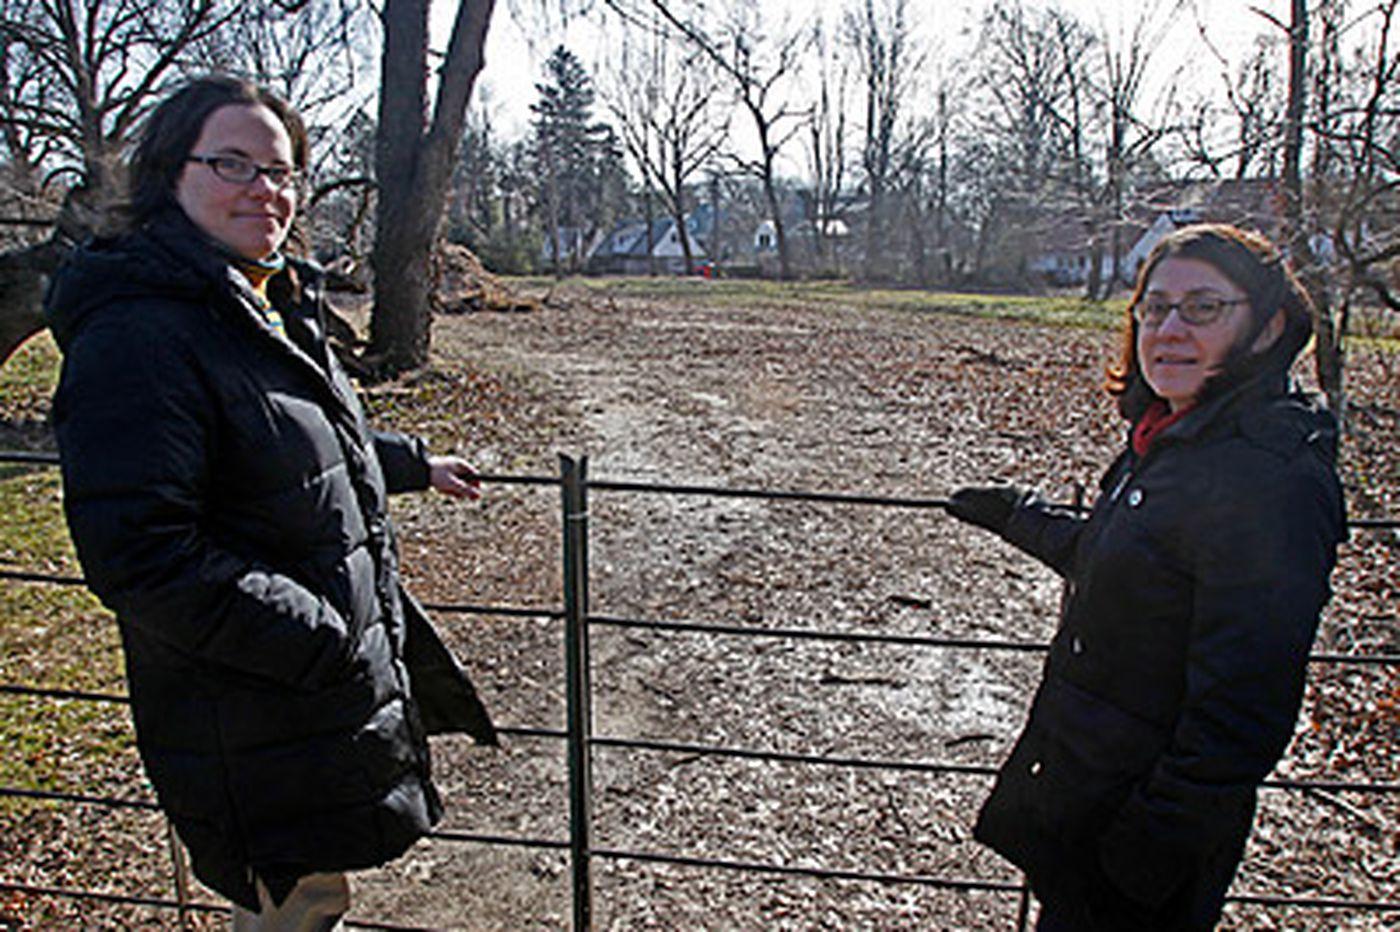 Wynnewood neighbors buy up meadow - preserving history and wildlife